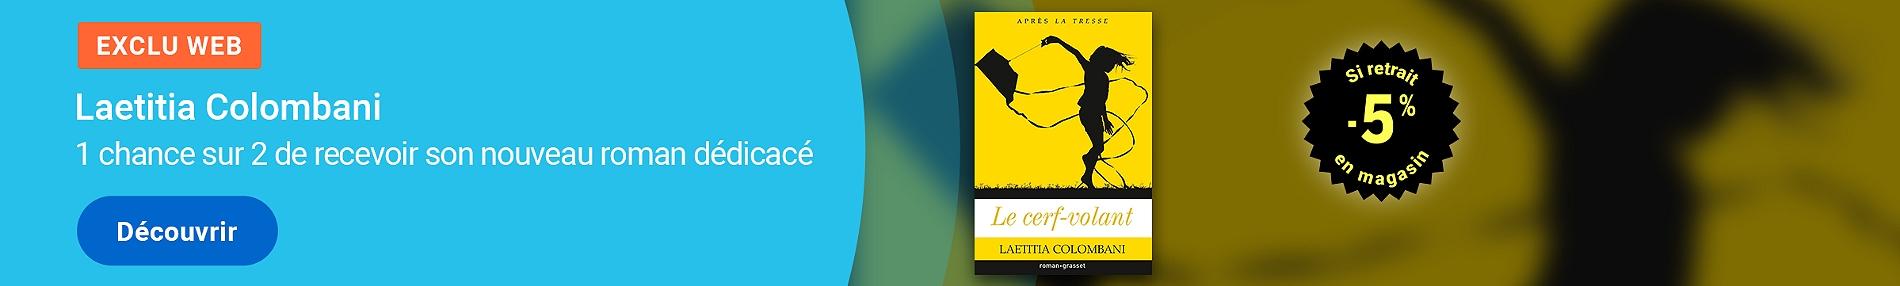 Laetitia Colombani - Le cerf volant